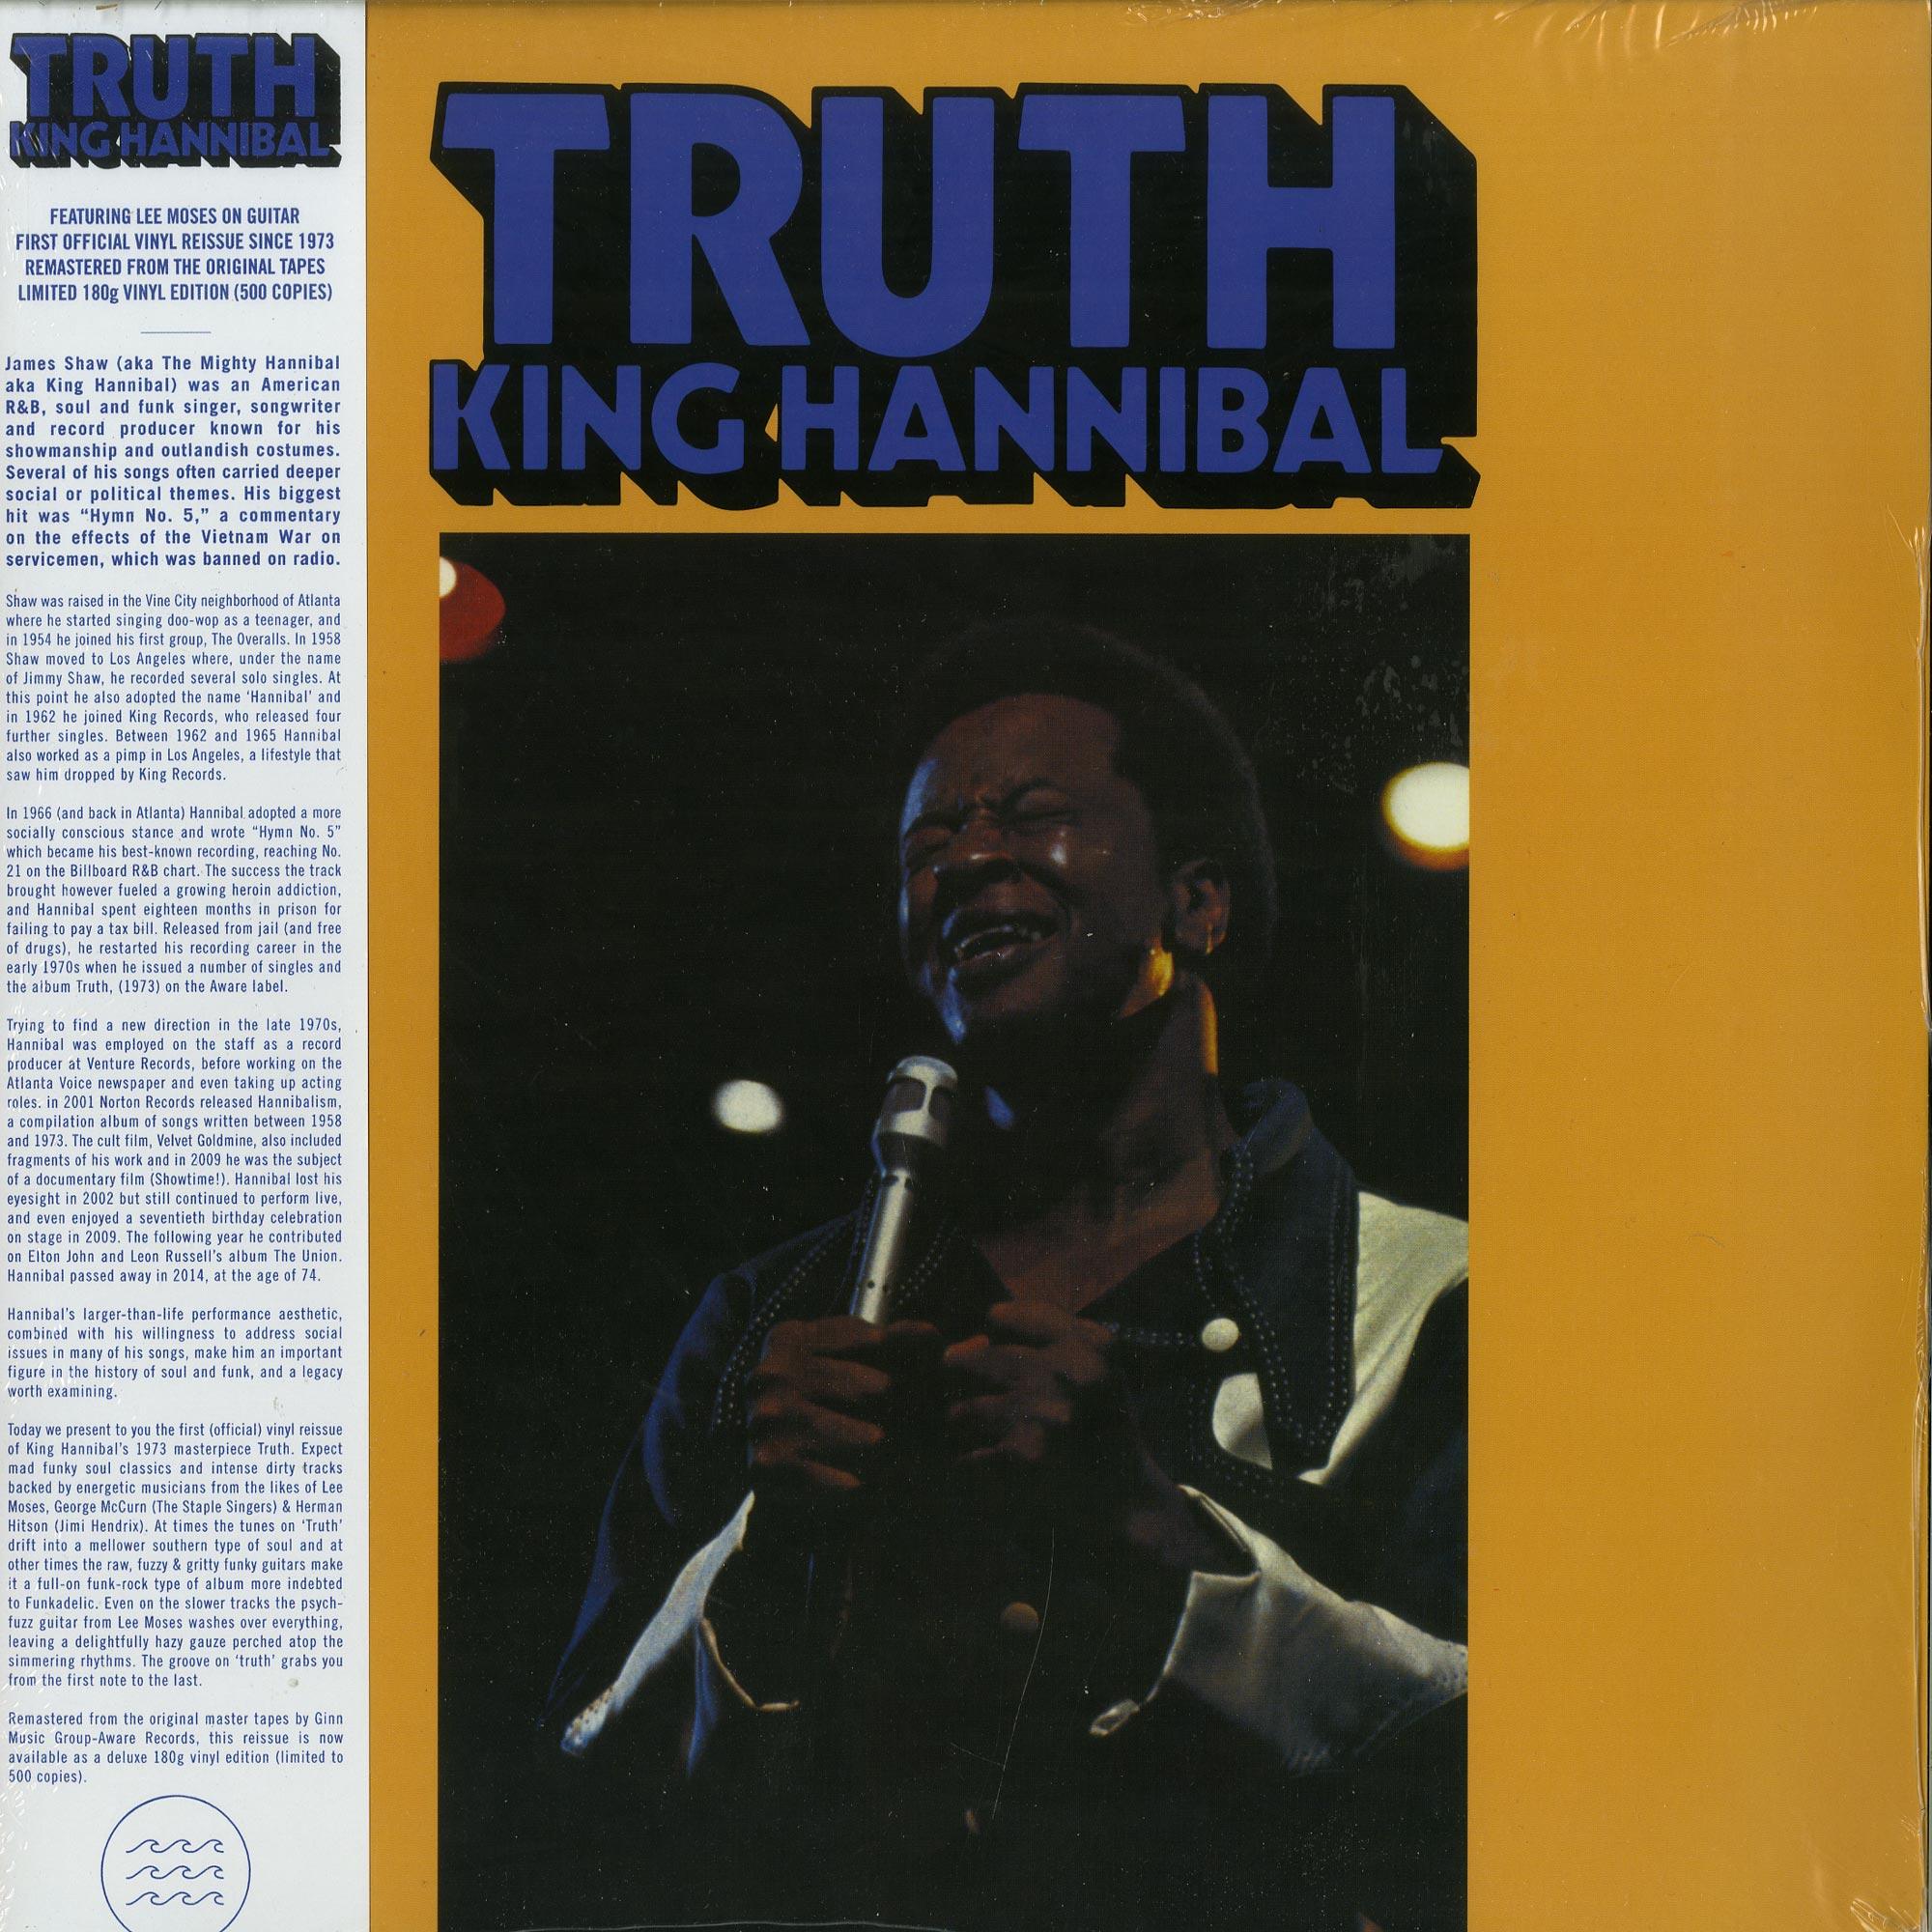 King Hannibal - TRUTH